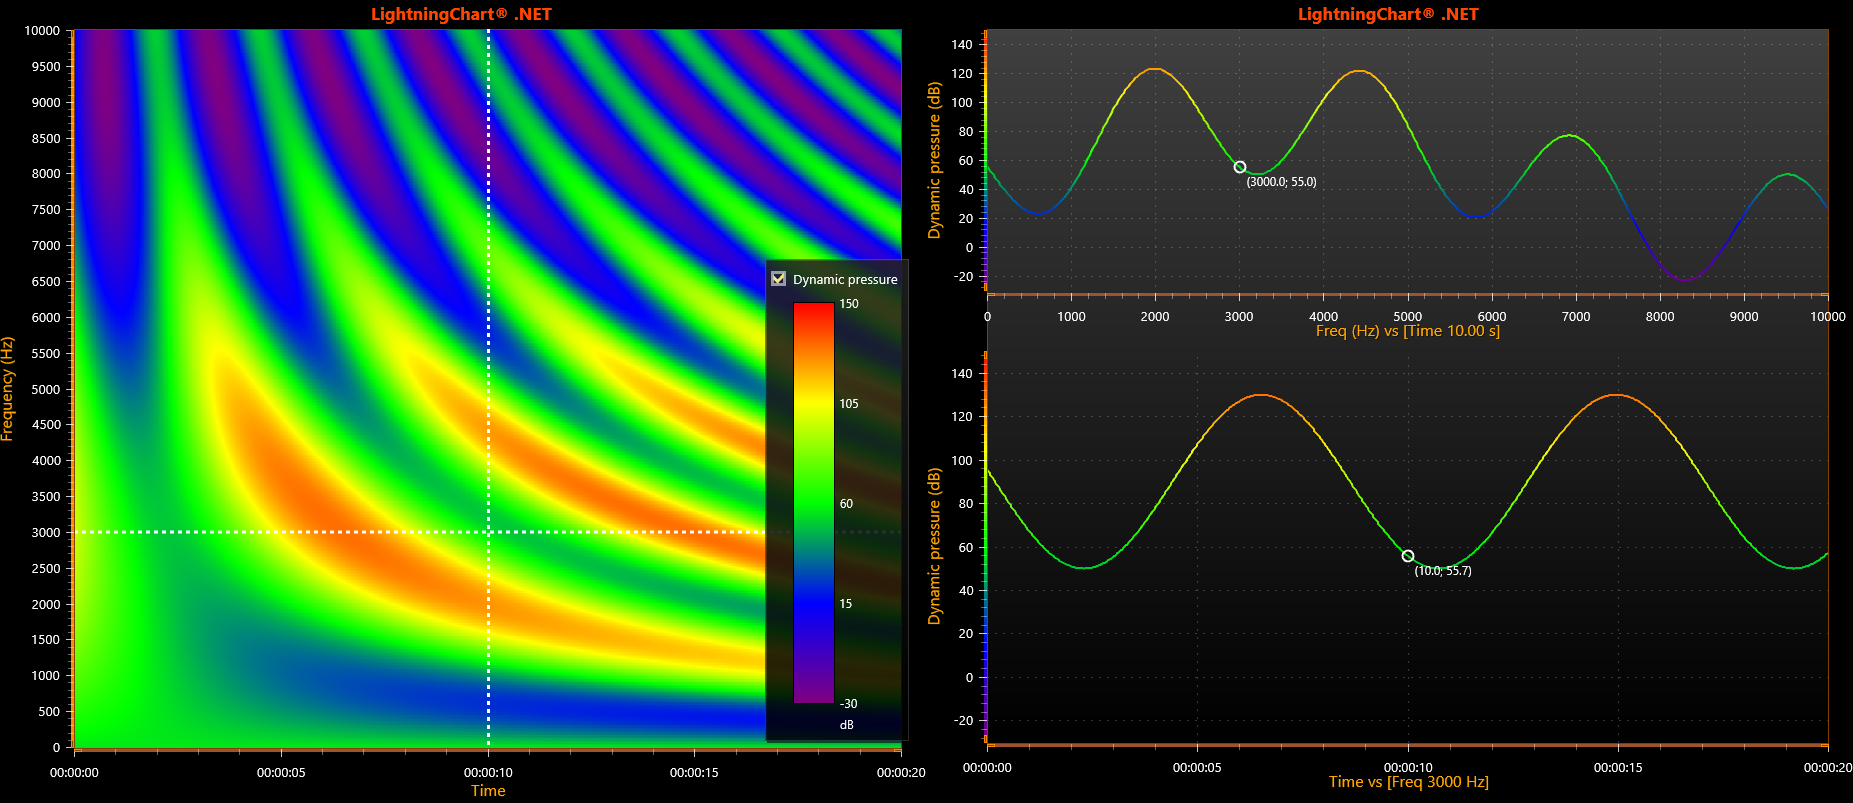 Vibration data cross-section